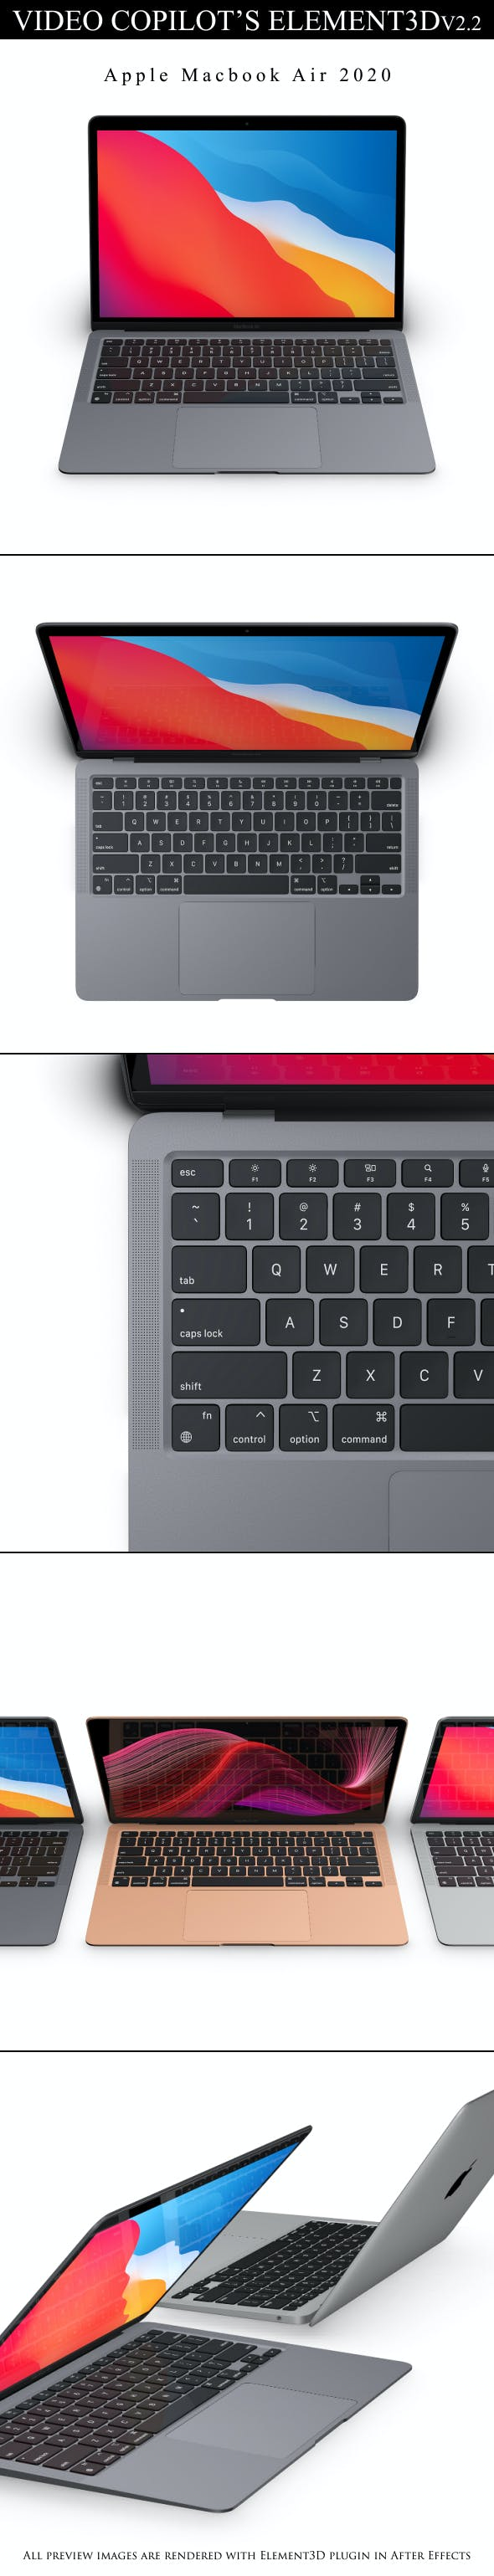 Element3D - Macbook Air M1 2020 - 3DOcean Item for Sale